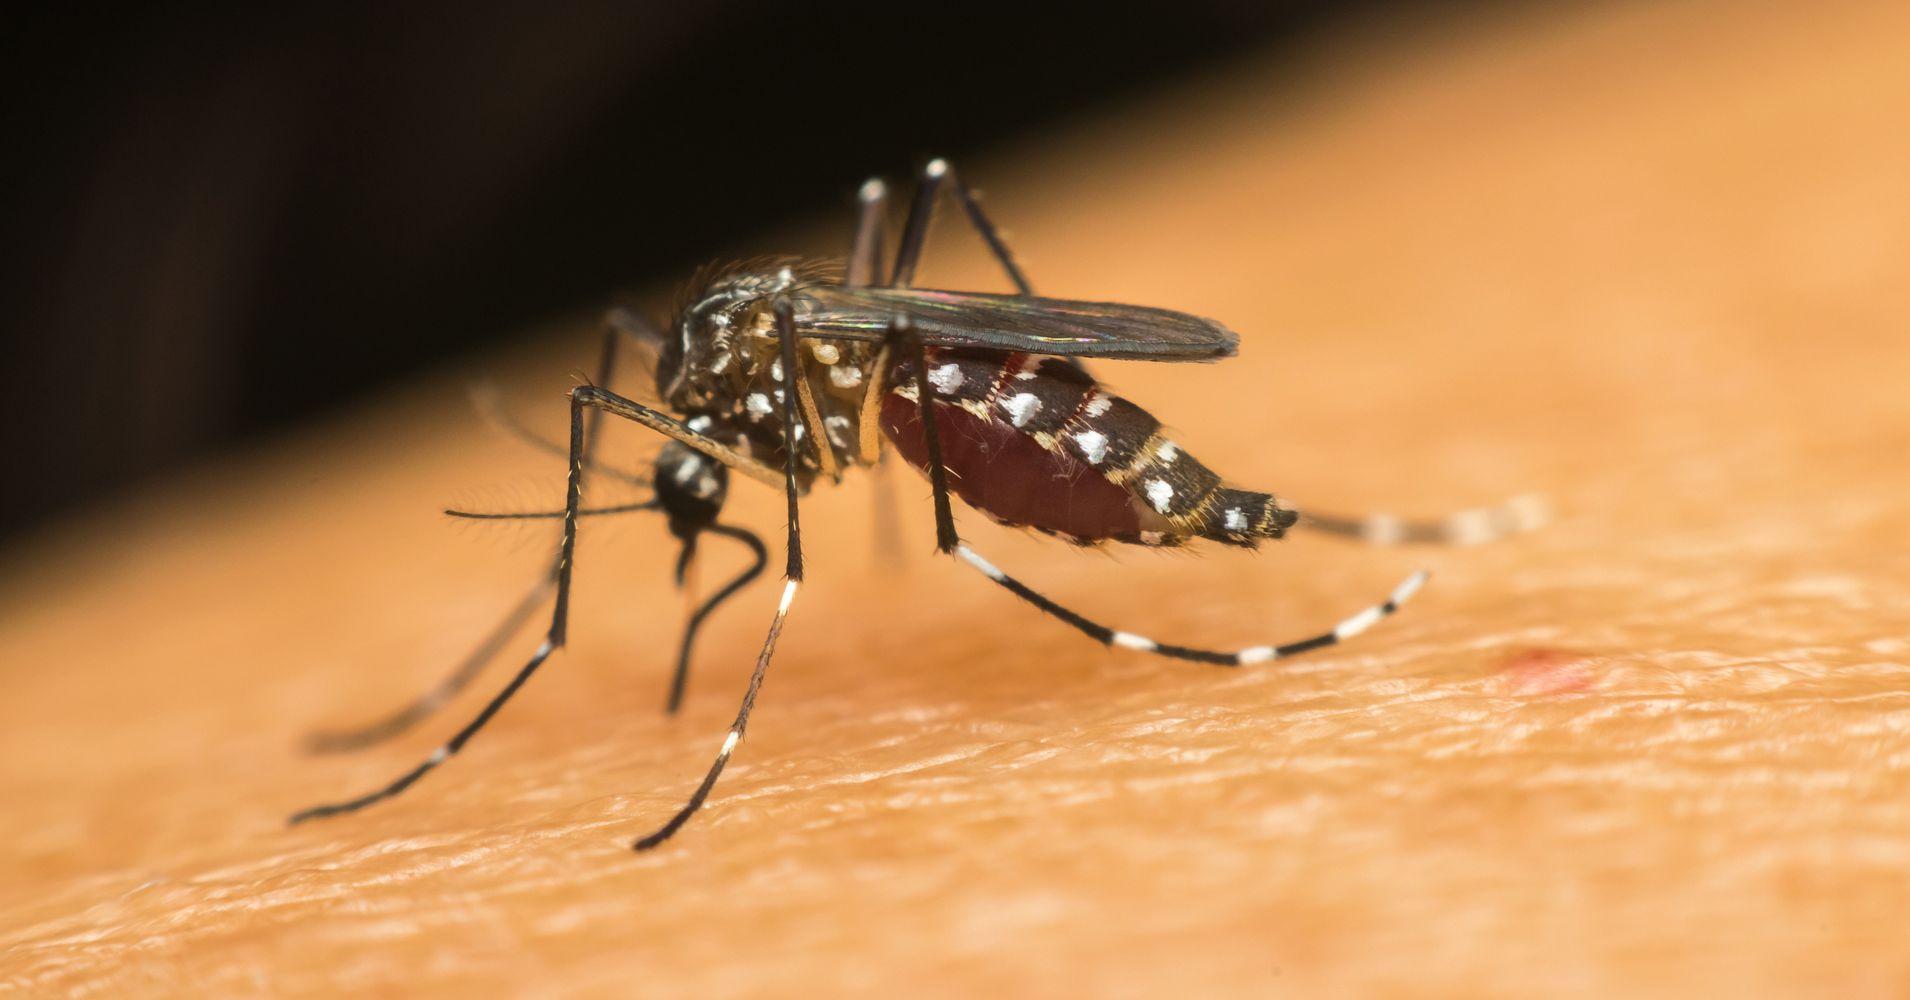 Molecular Docking Based Screening of Plant Flavonoids as Dengue NS1 Inhibitors